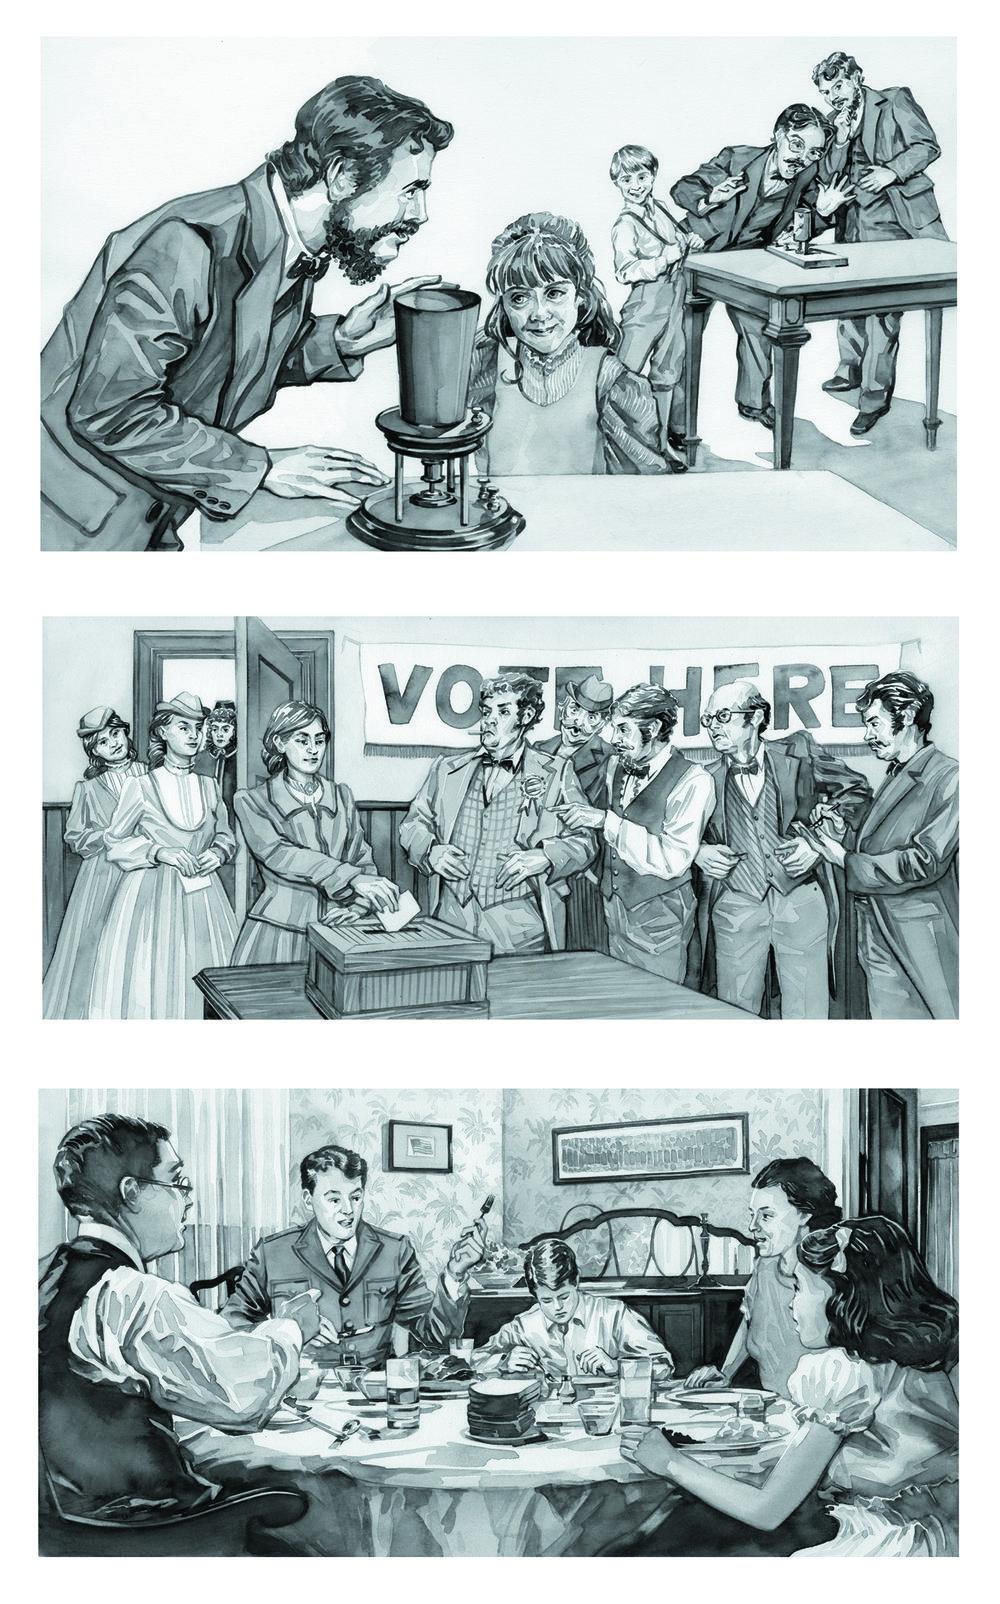 American History for Scholastic Magazine